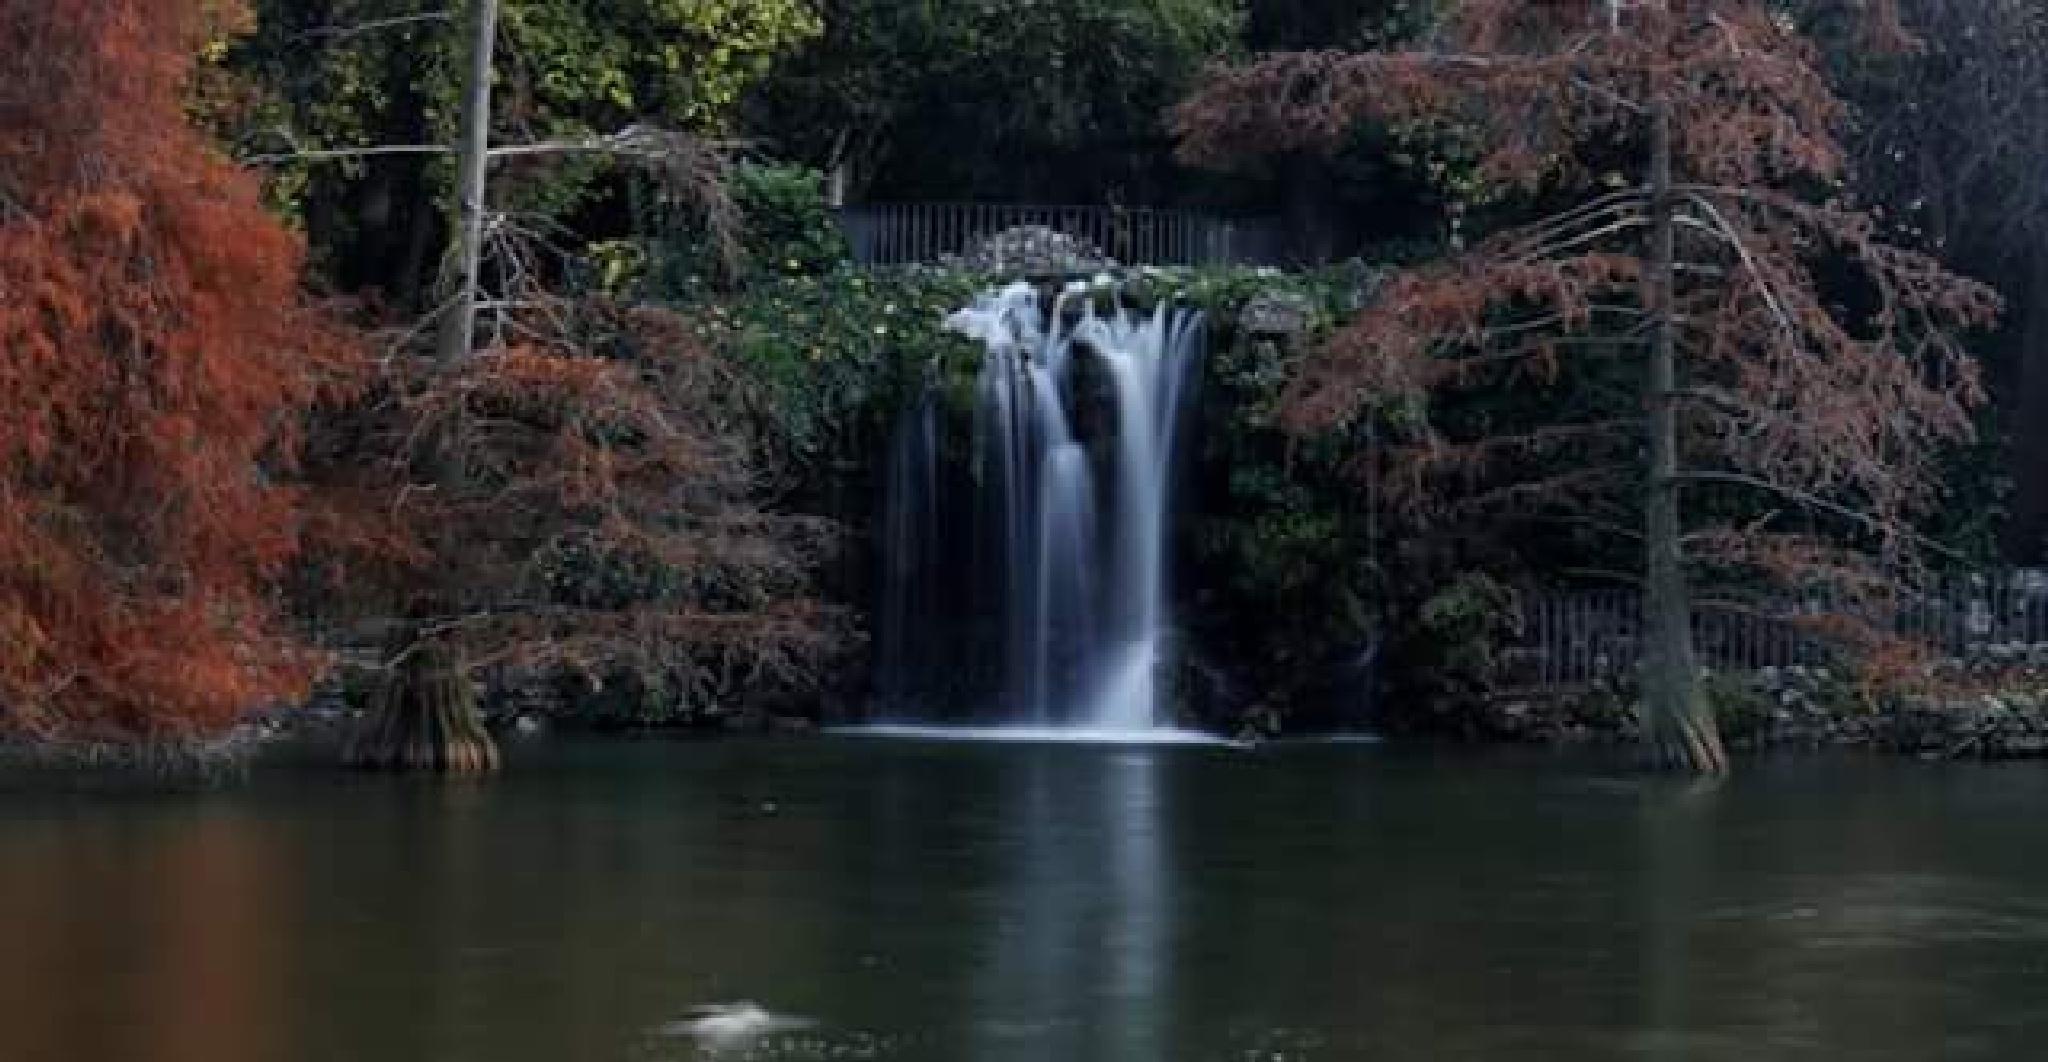 retiro park, madrid by thierrylorenzo